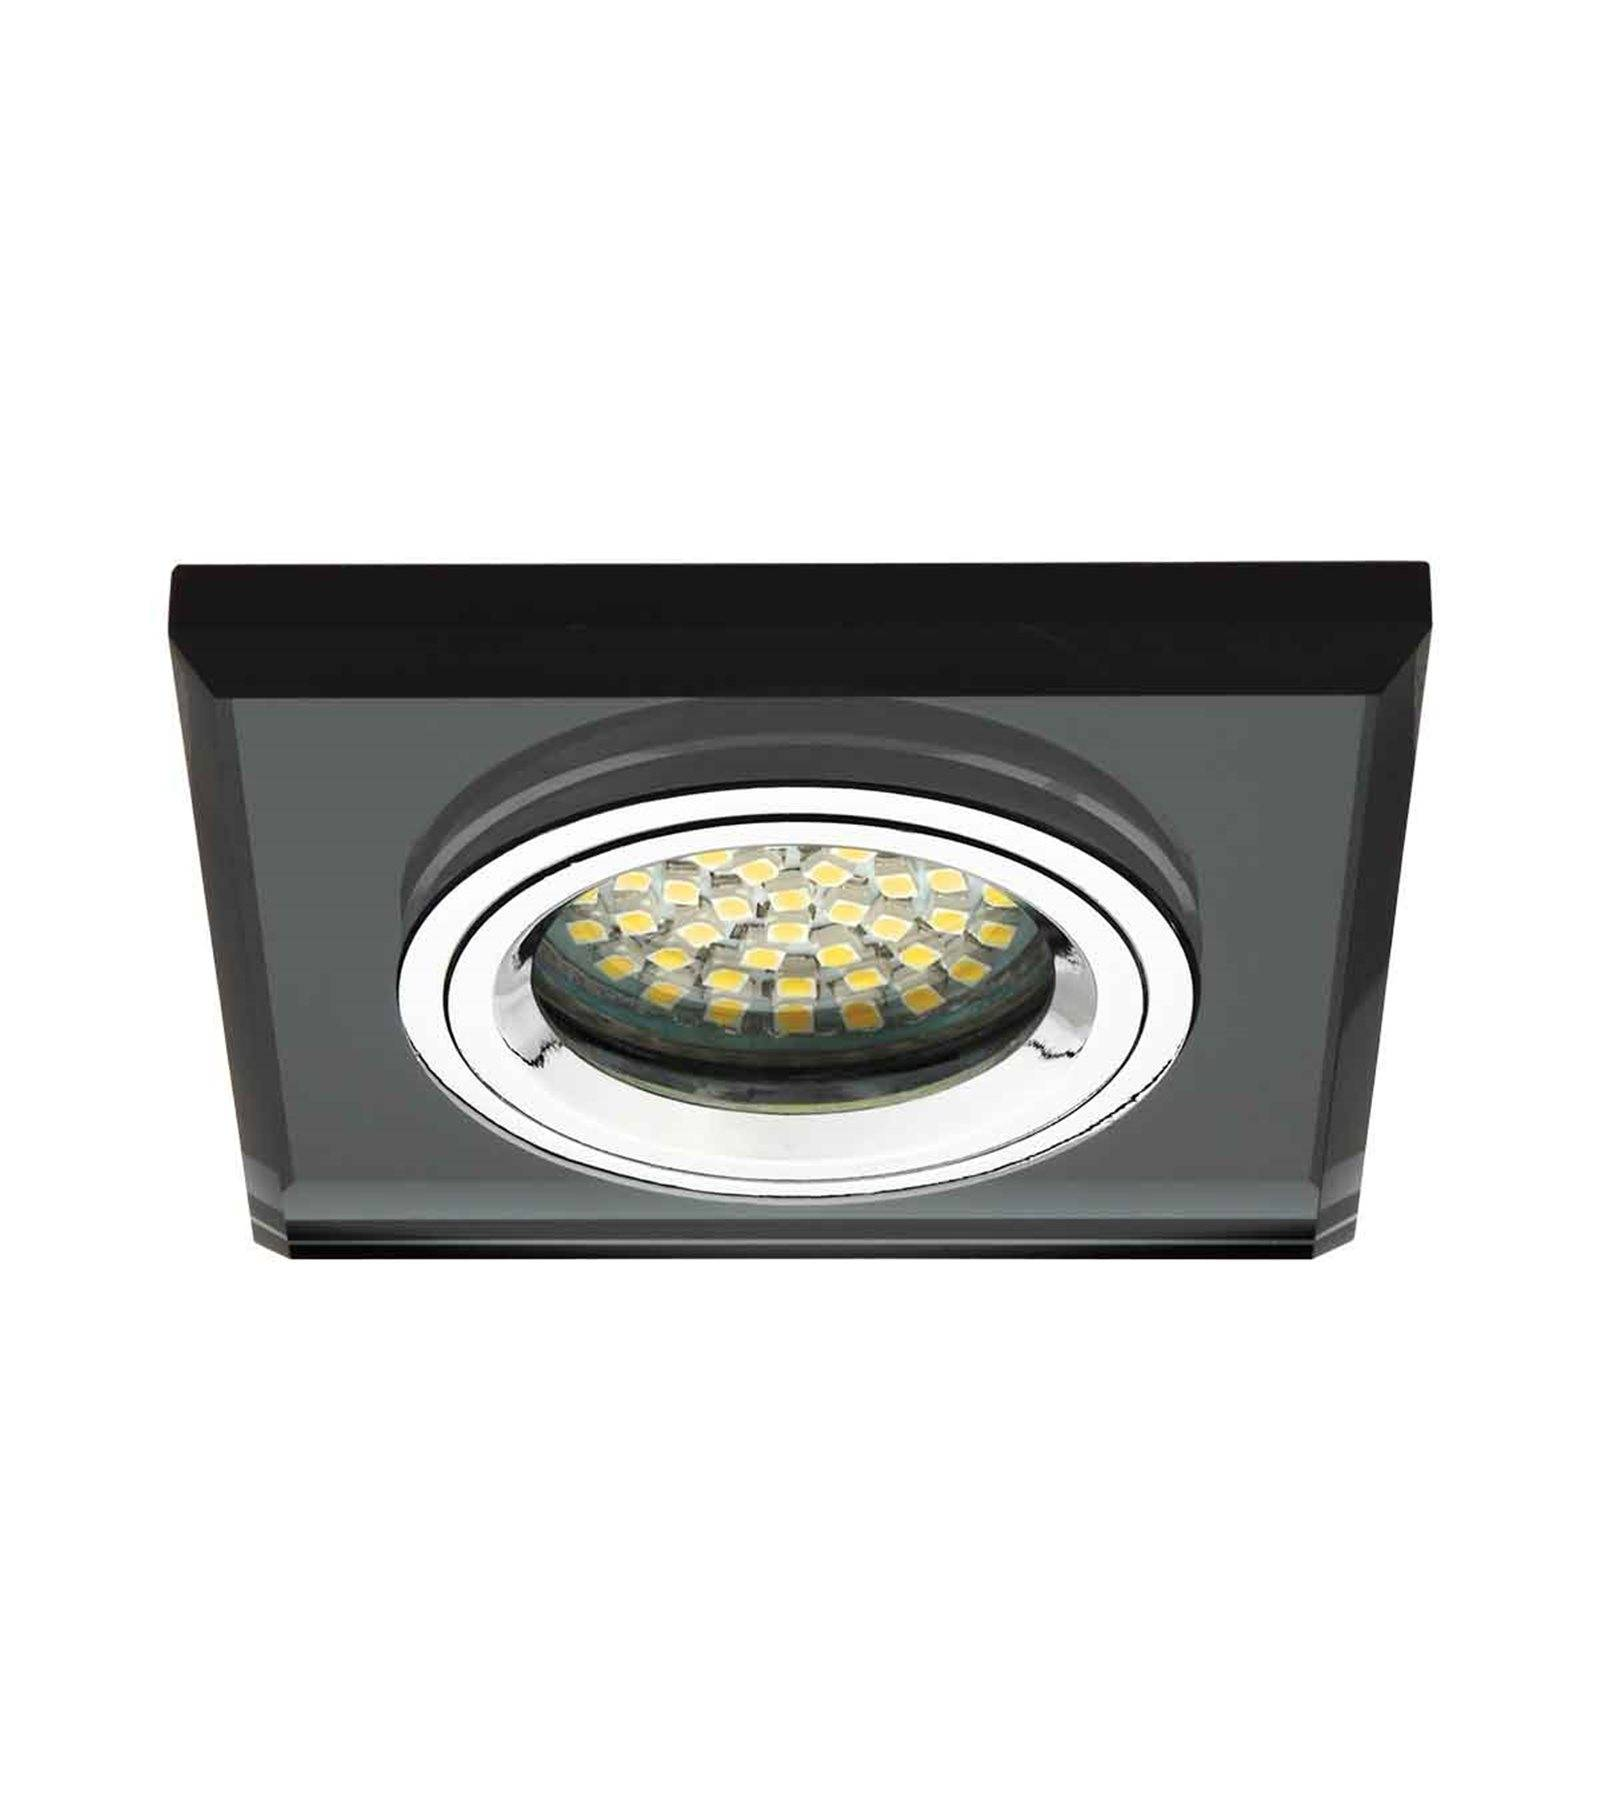 spot encastrable plafonnier morta noir carr gu5 3 gu10. Black Bedroom Furniture Sets. Home Design Ideas